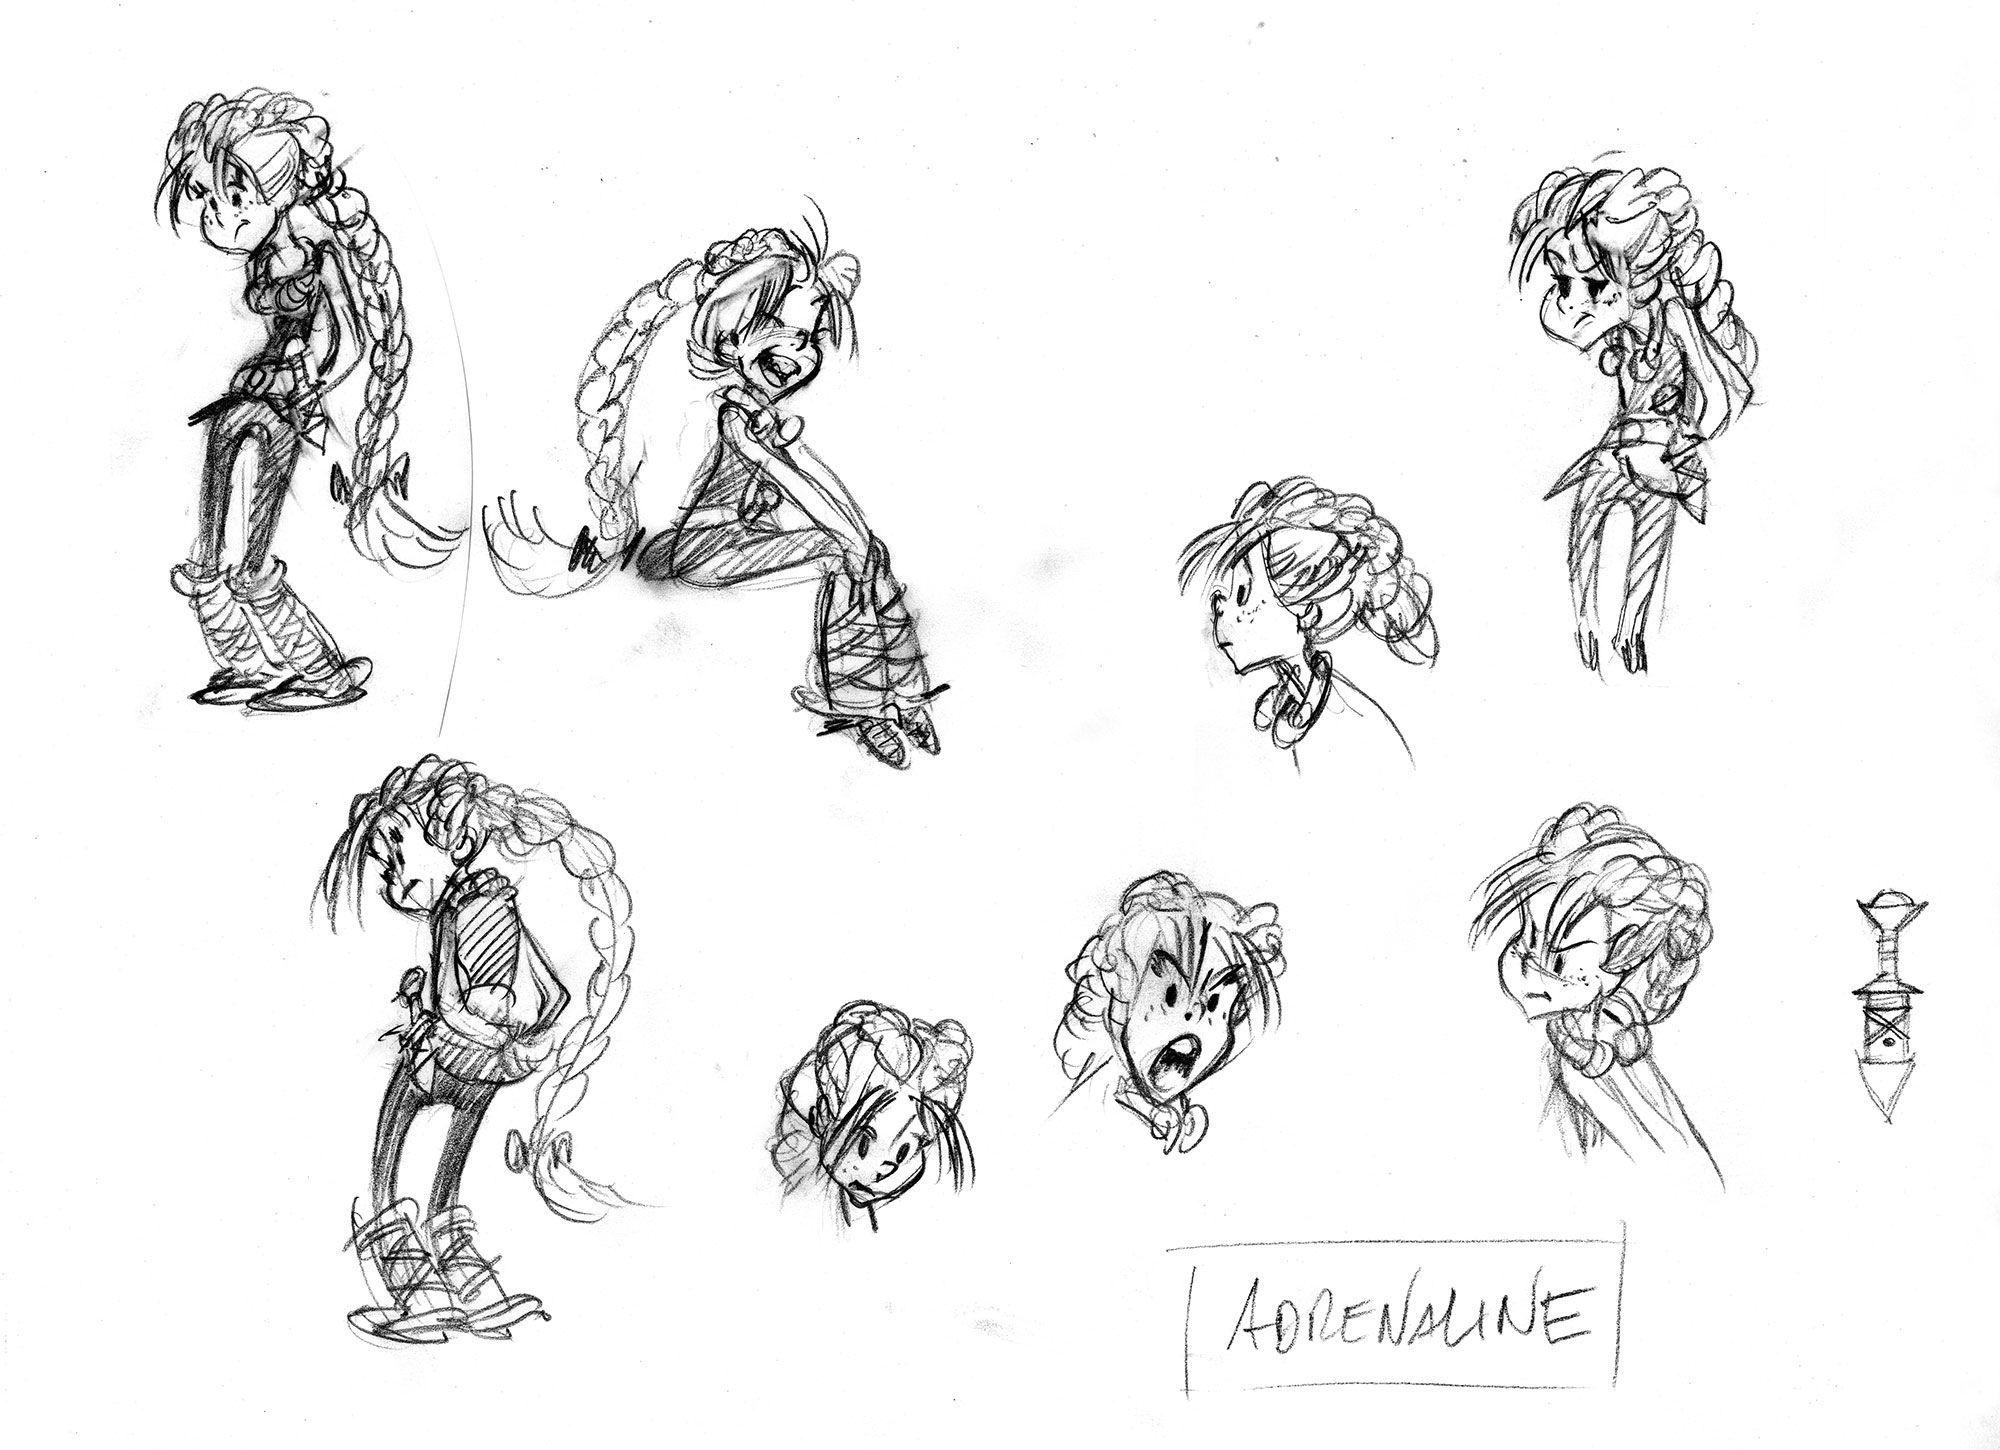 Les crayonnés de la jeune héroïne Adrénaline